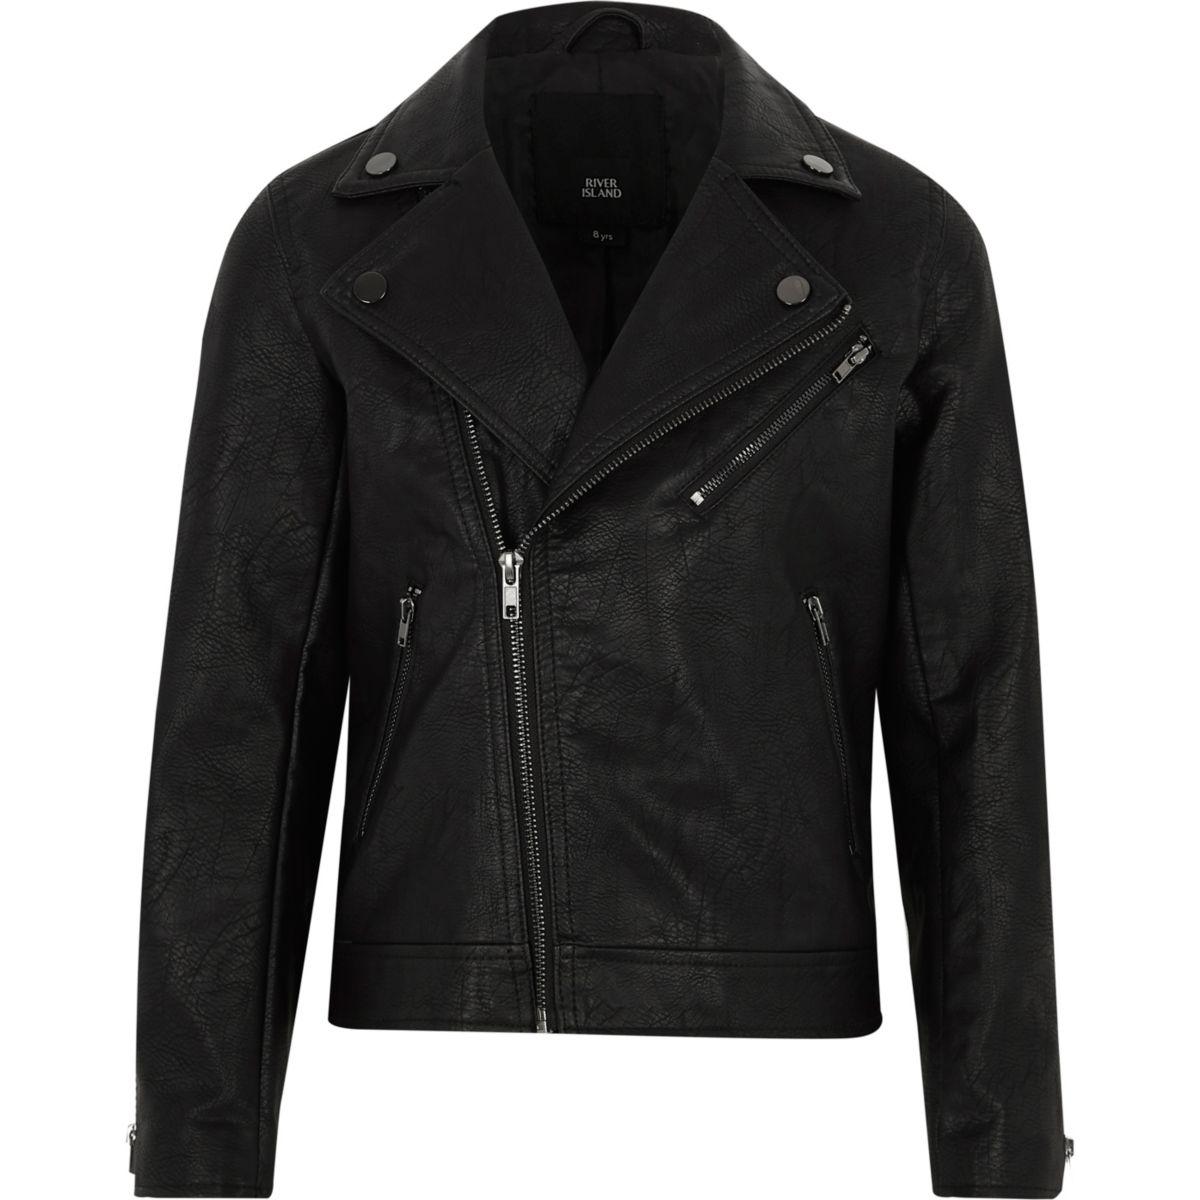 Boys black faux leather biker jacket